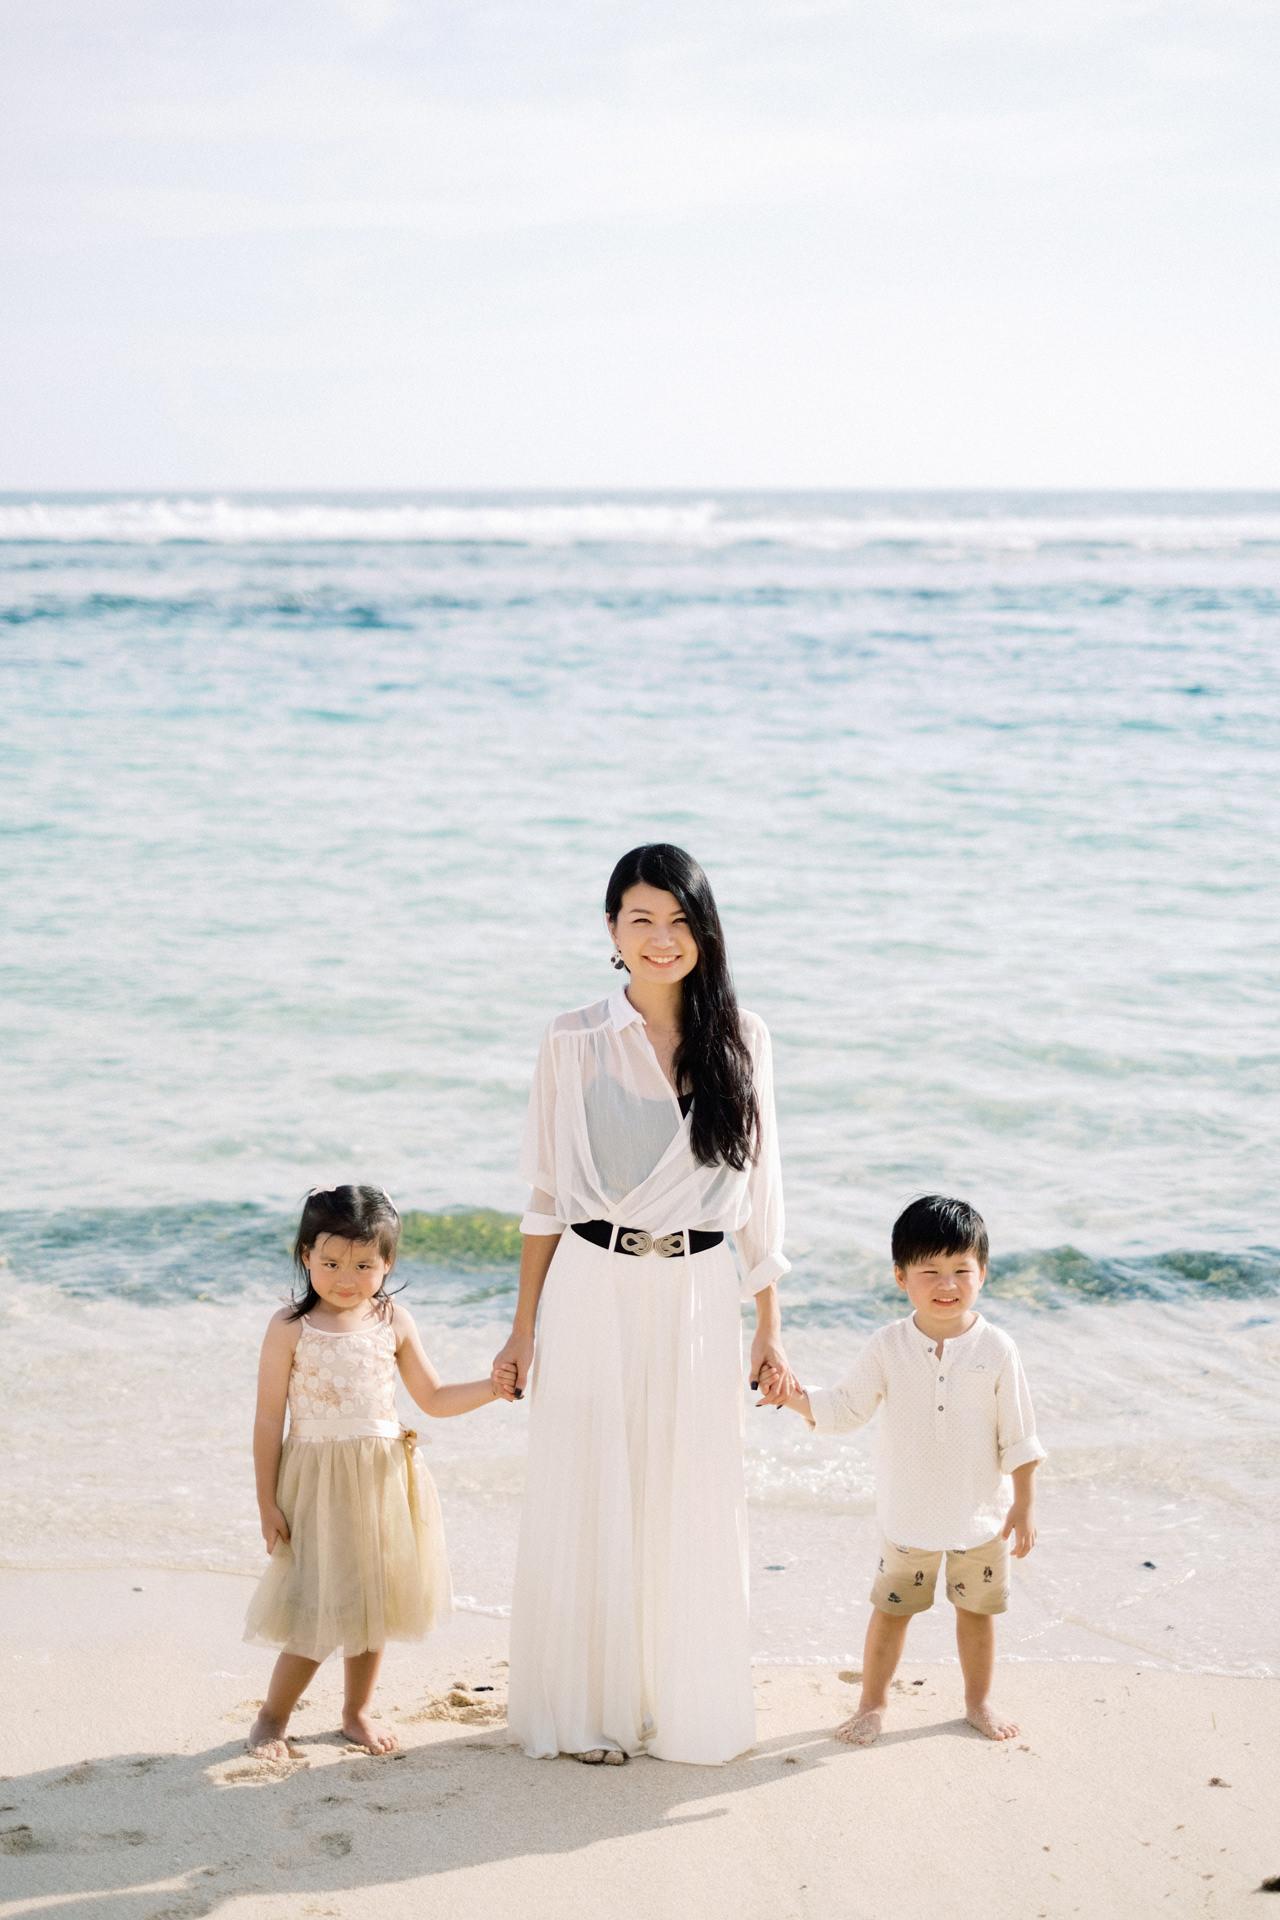 S&G: Bali Family Vacation Photo at The Beach 11